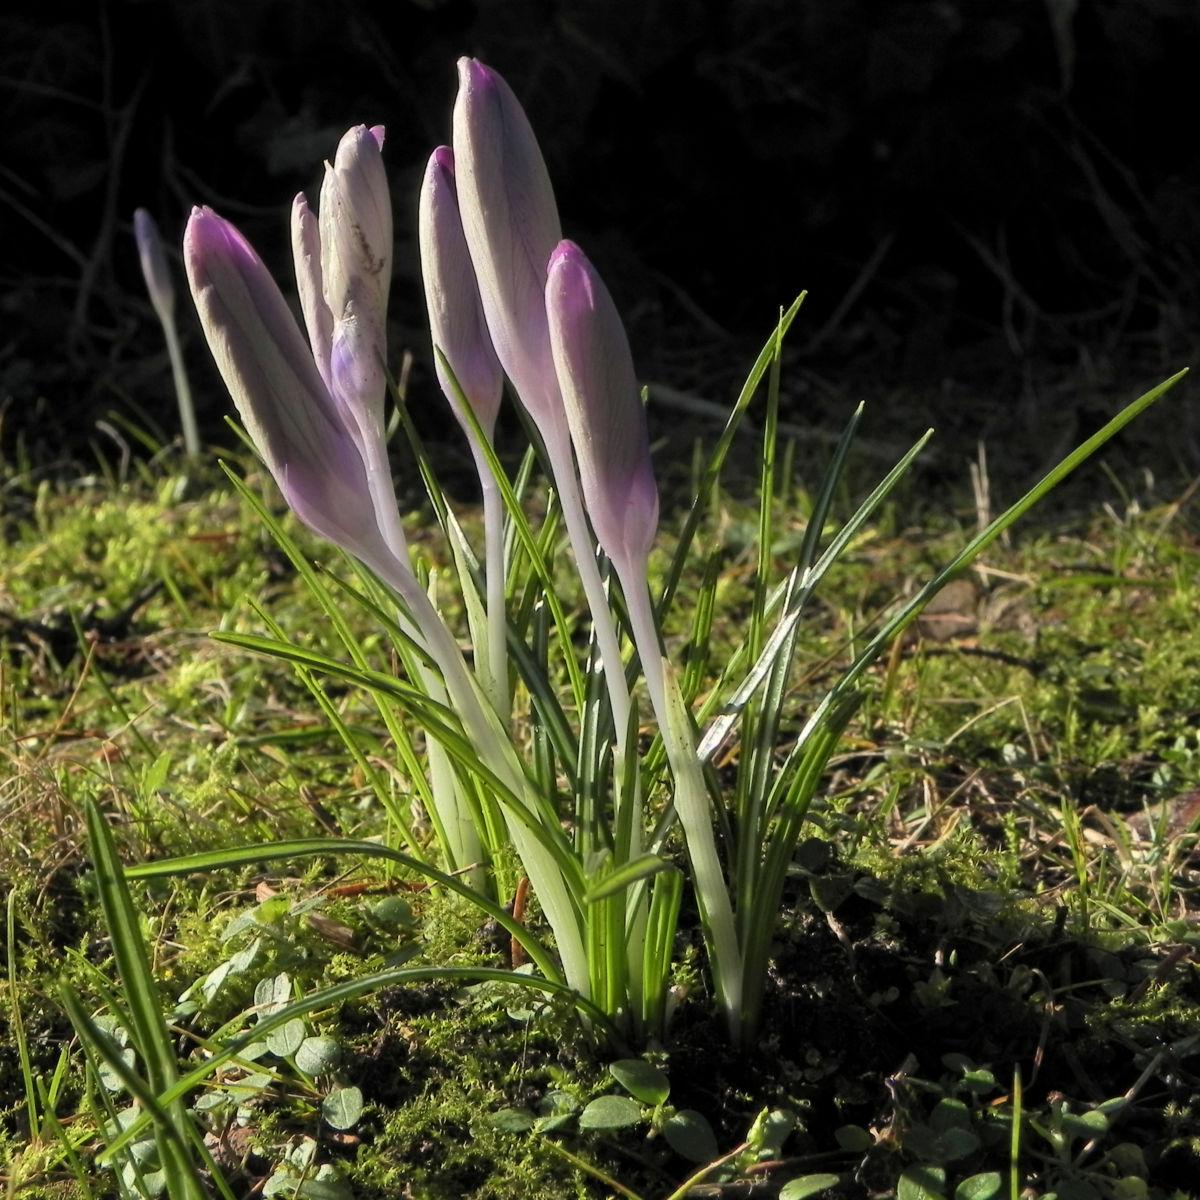 Fruehlings Krokus Bluete lila Crocus vernus